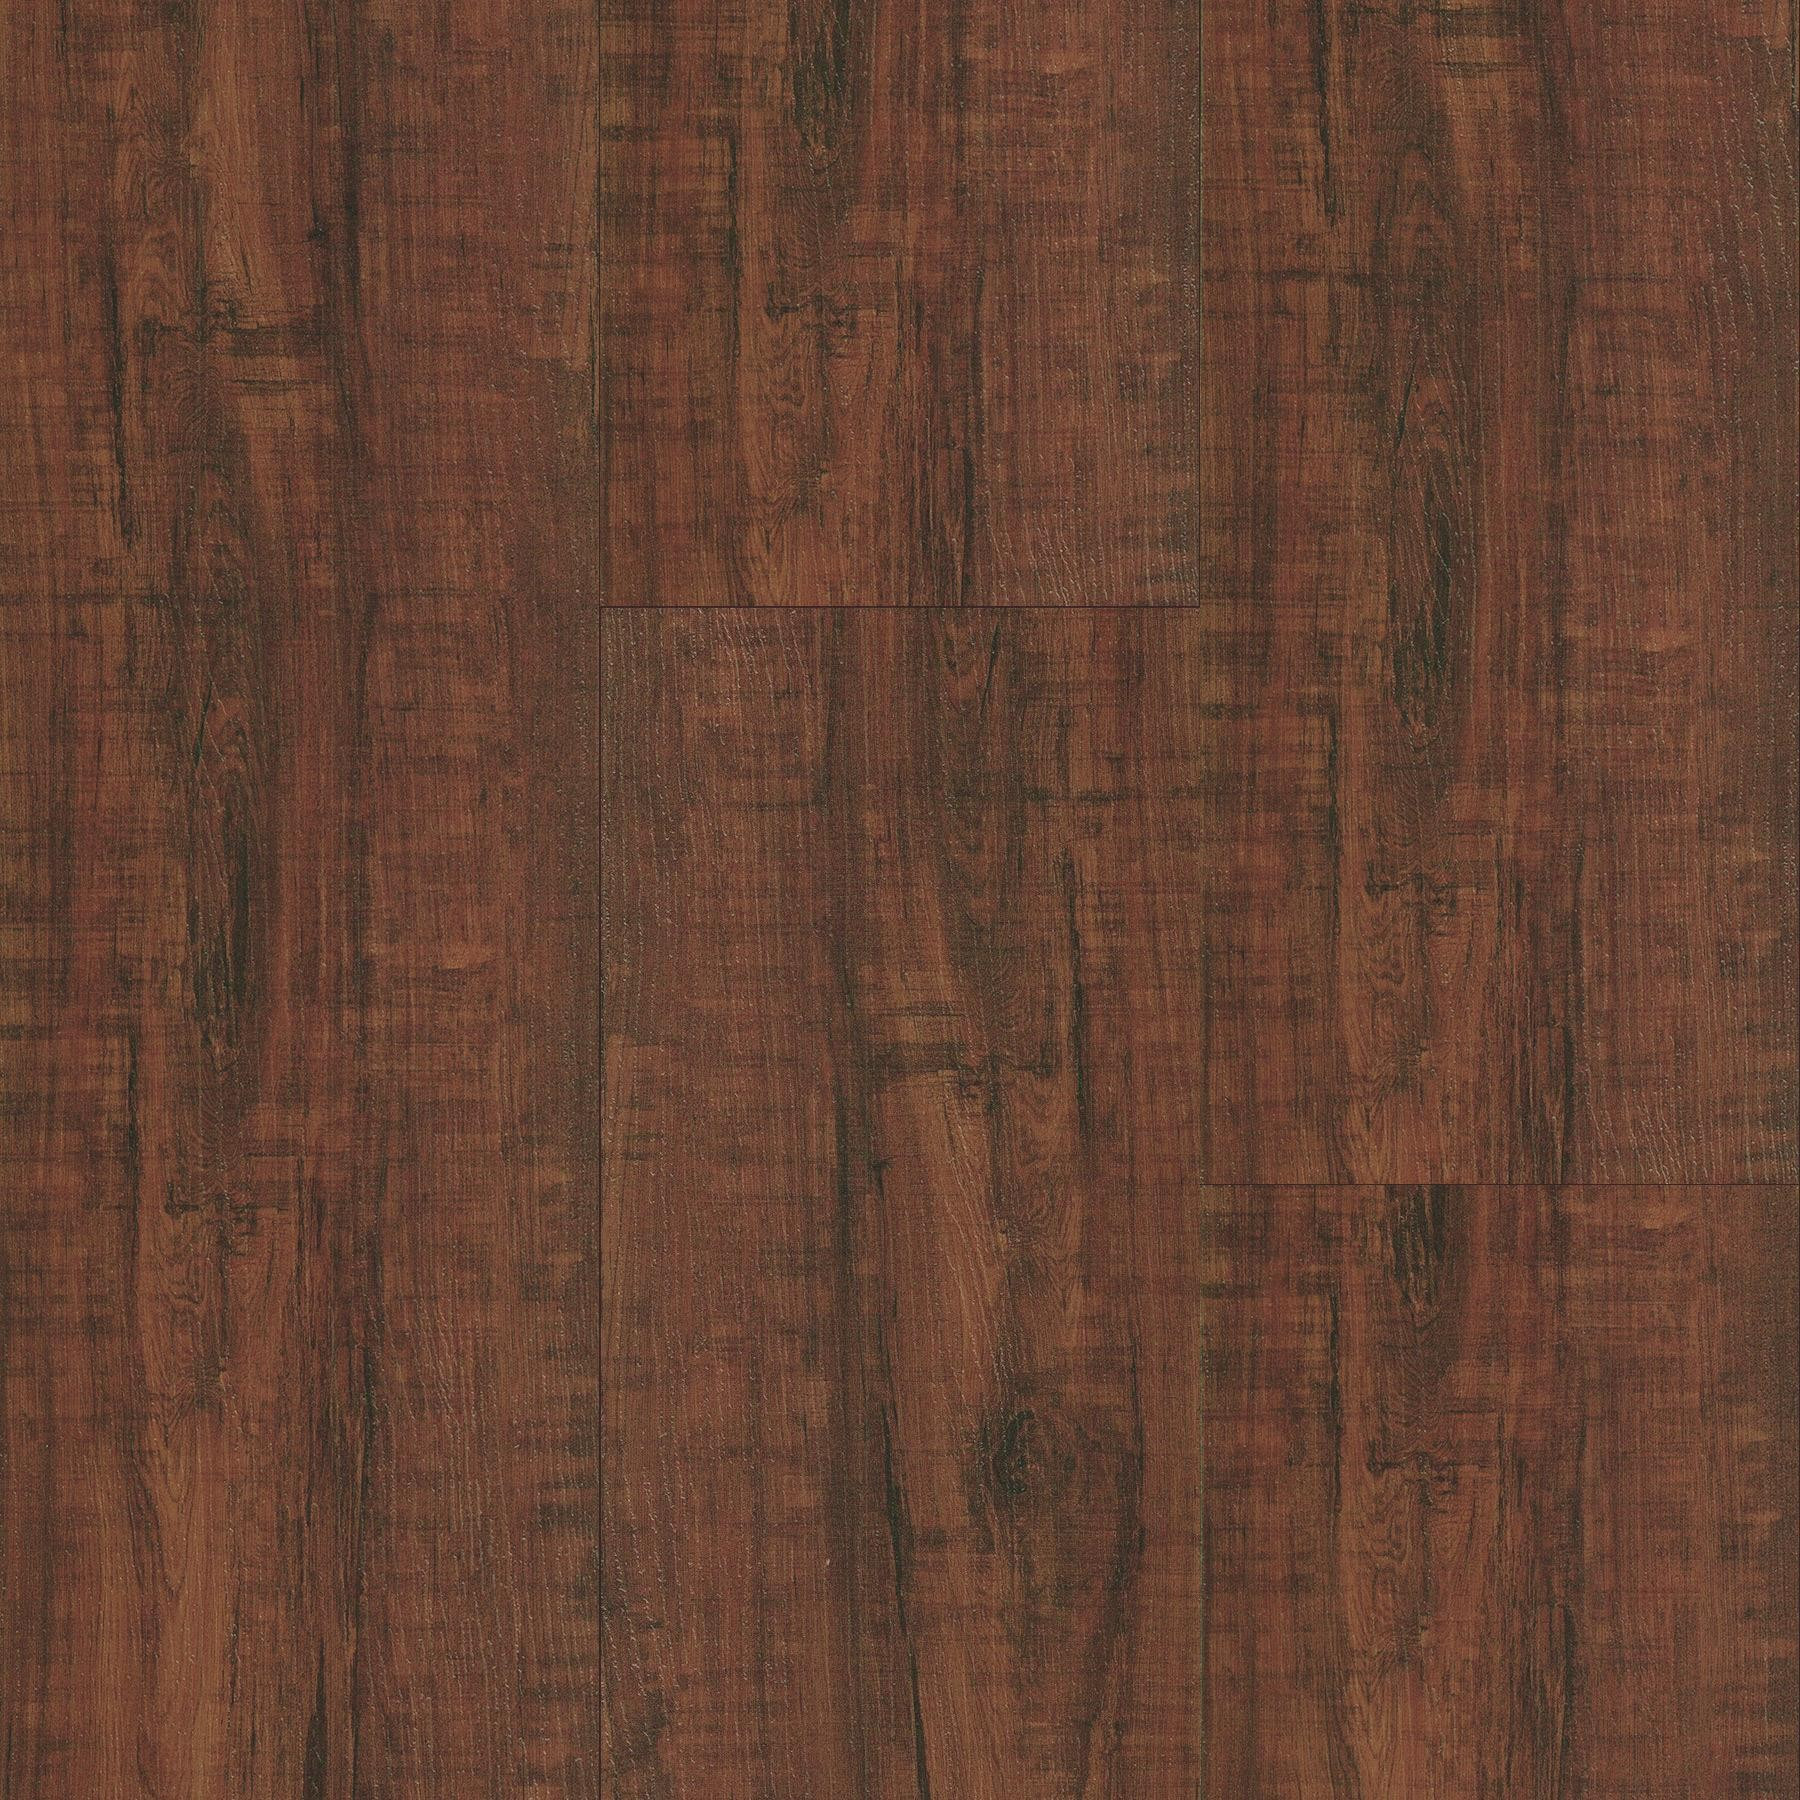 menards hardwood floor cleaner of 19 awesome pergo vs hardwood pics dizpos com pertaining to pergo vs hardwood new 8mm laminate flooring photos of 19 awesome pergo vs hardwood pics